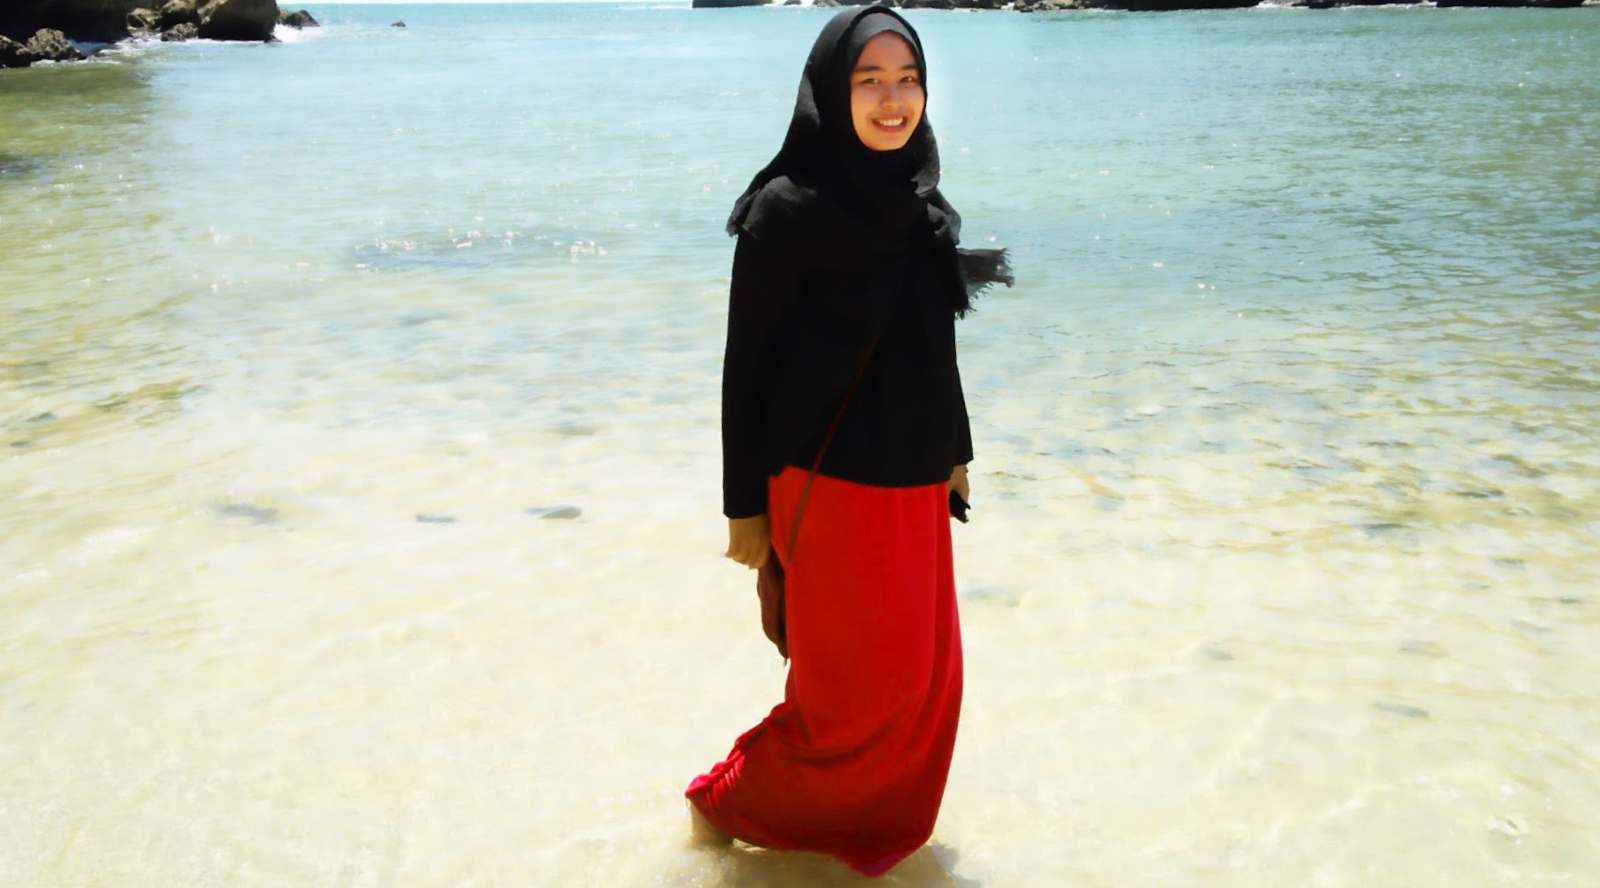 hijab gaul tidak syar'i tutorial hijab gaul simple hijab gaul tutorial